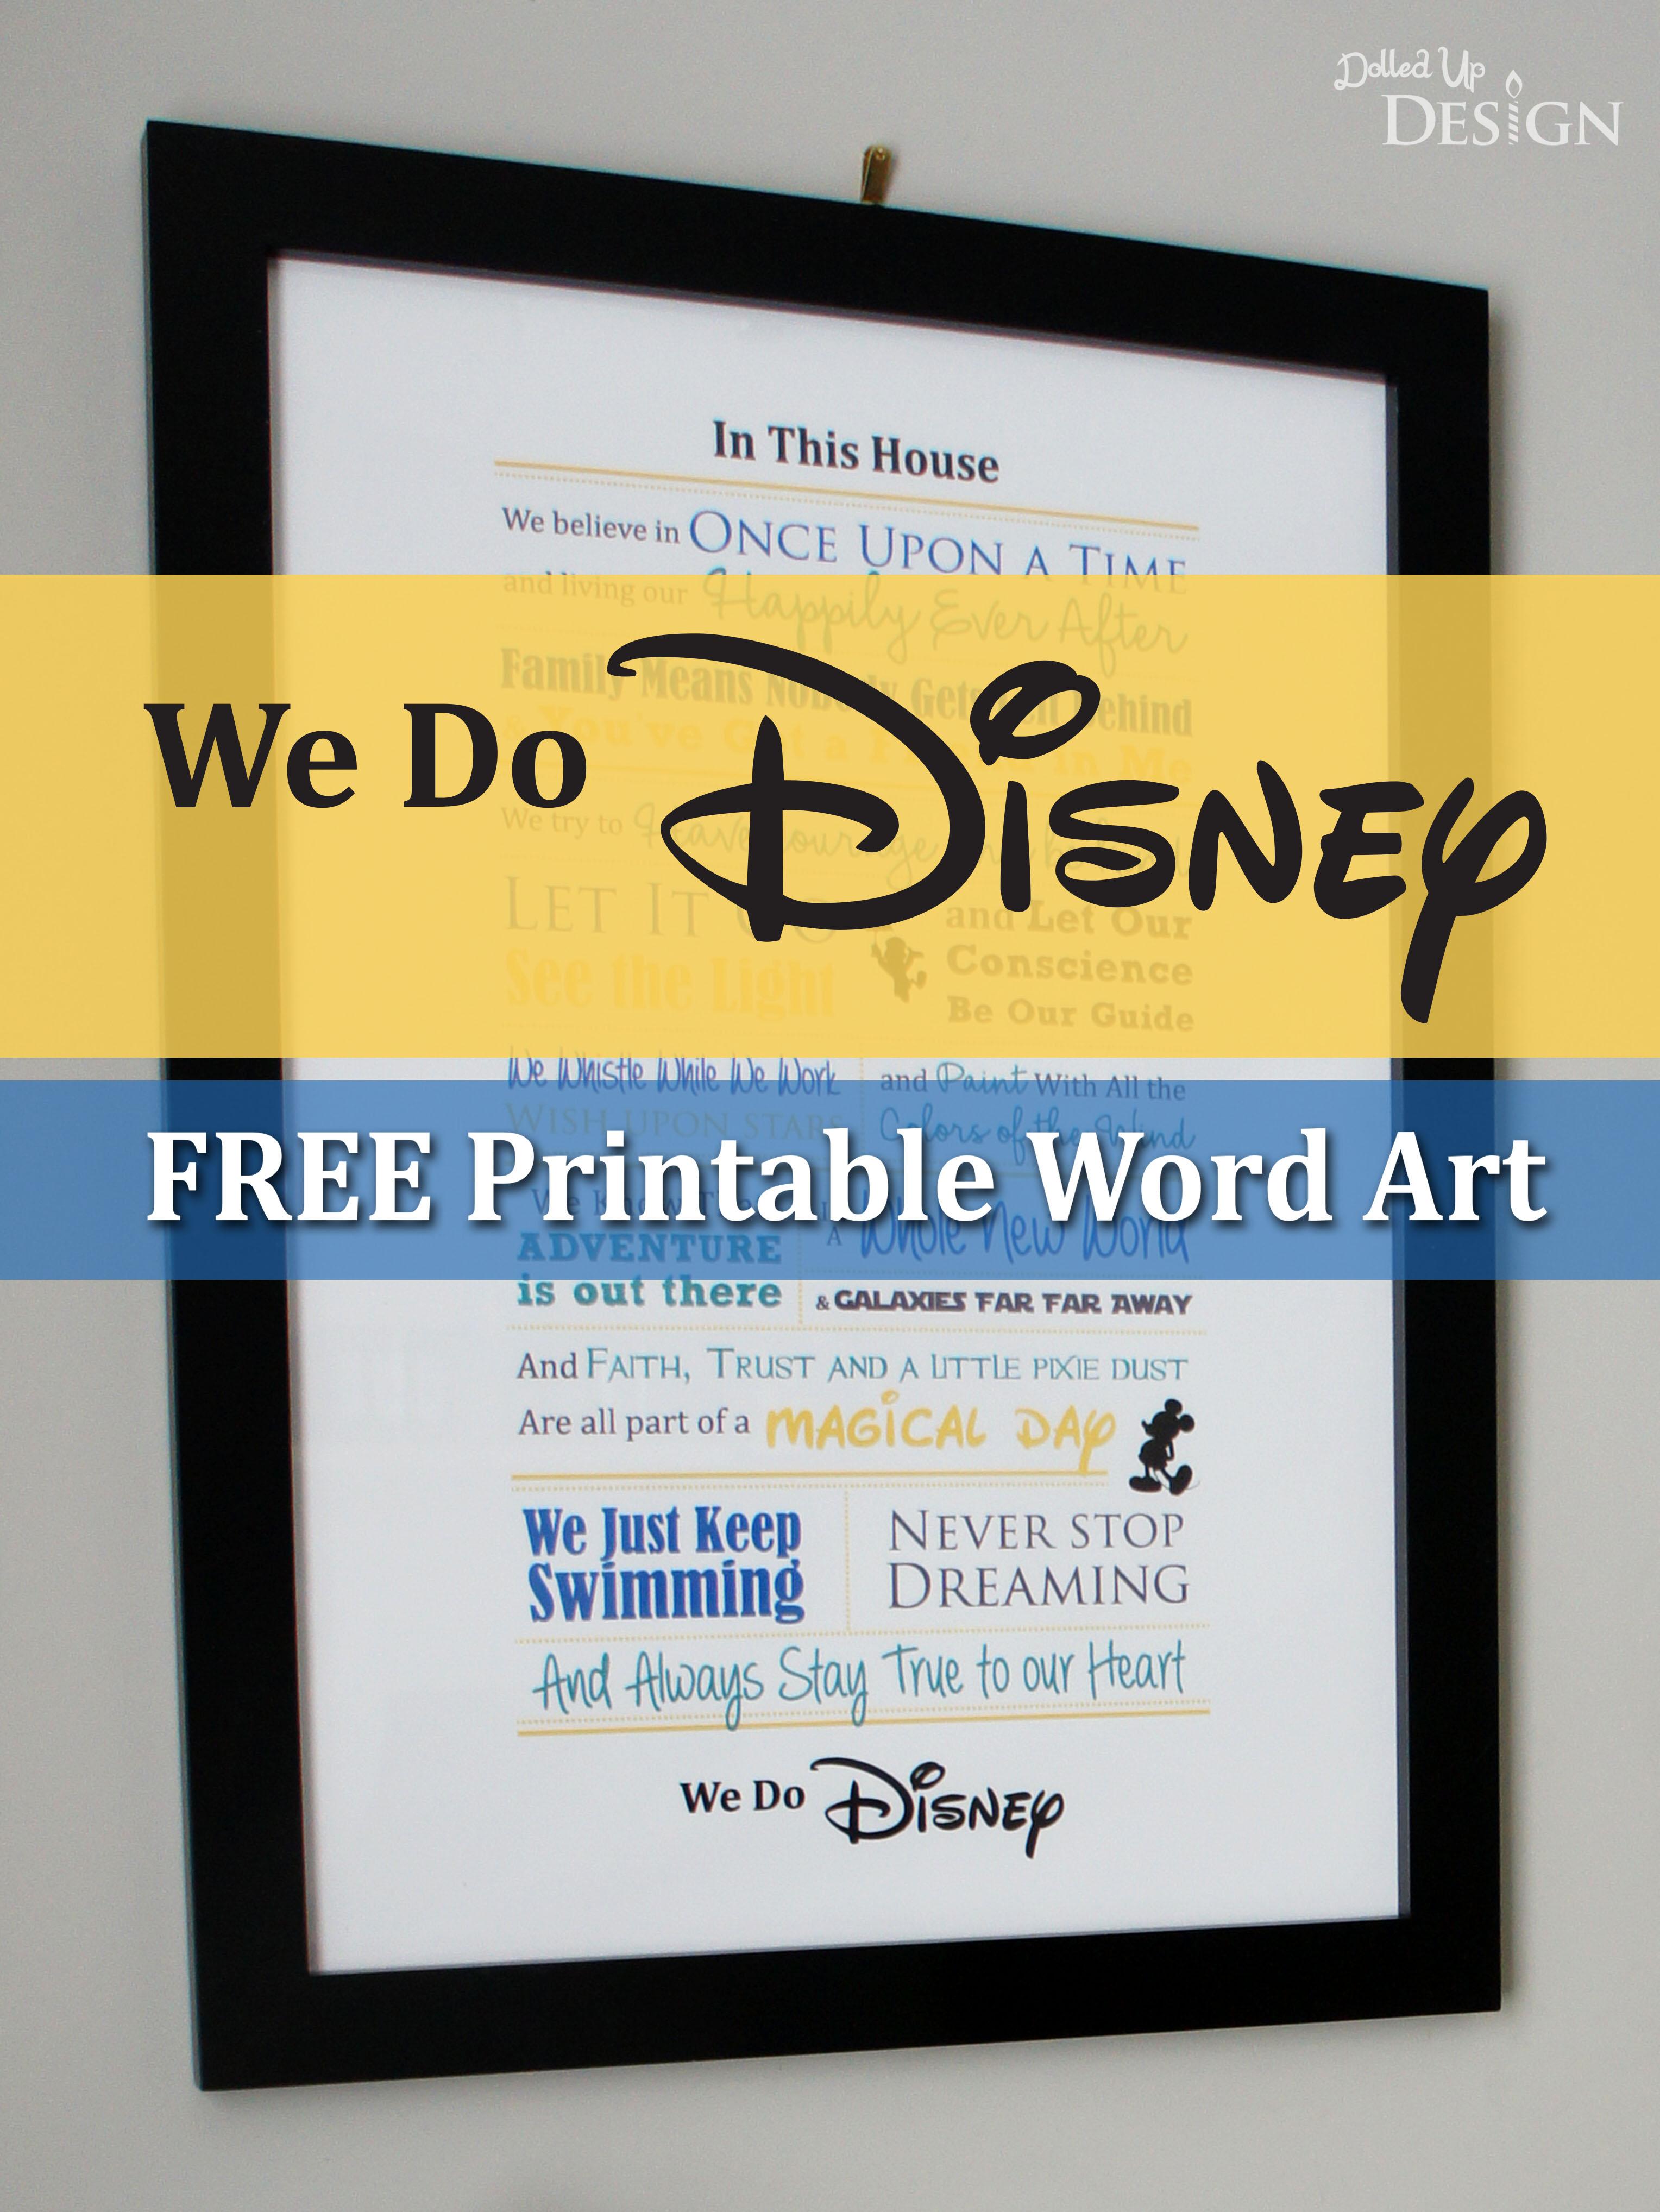 We Do Disney Free Printable Word Art